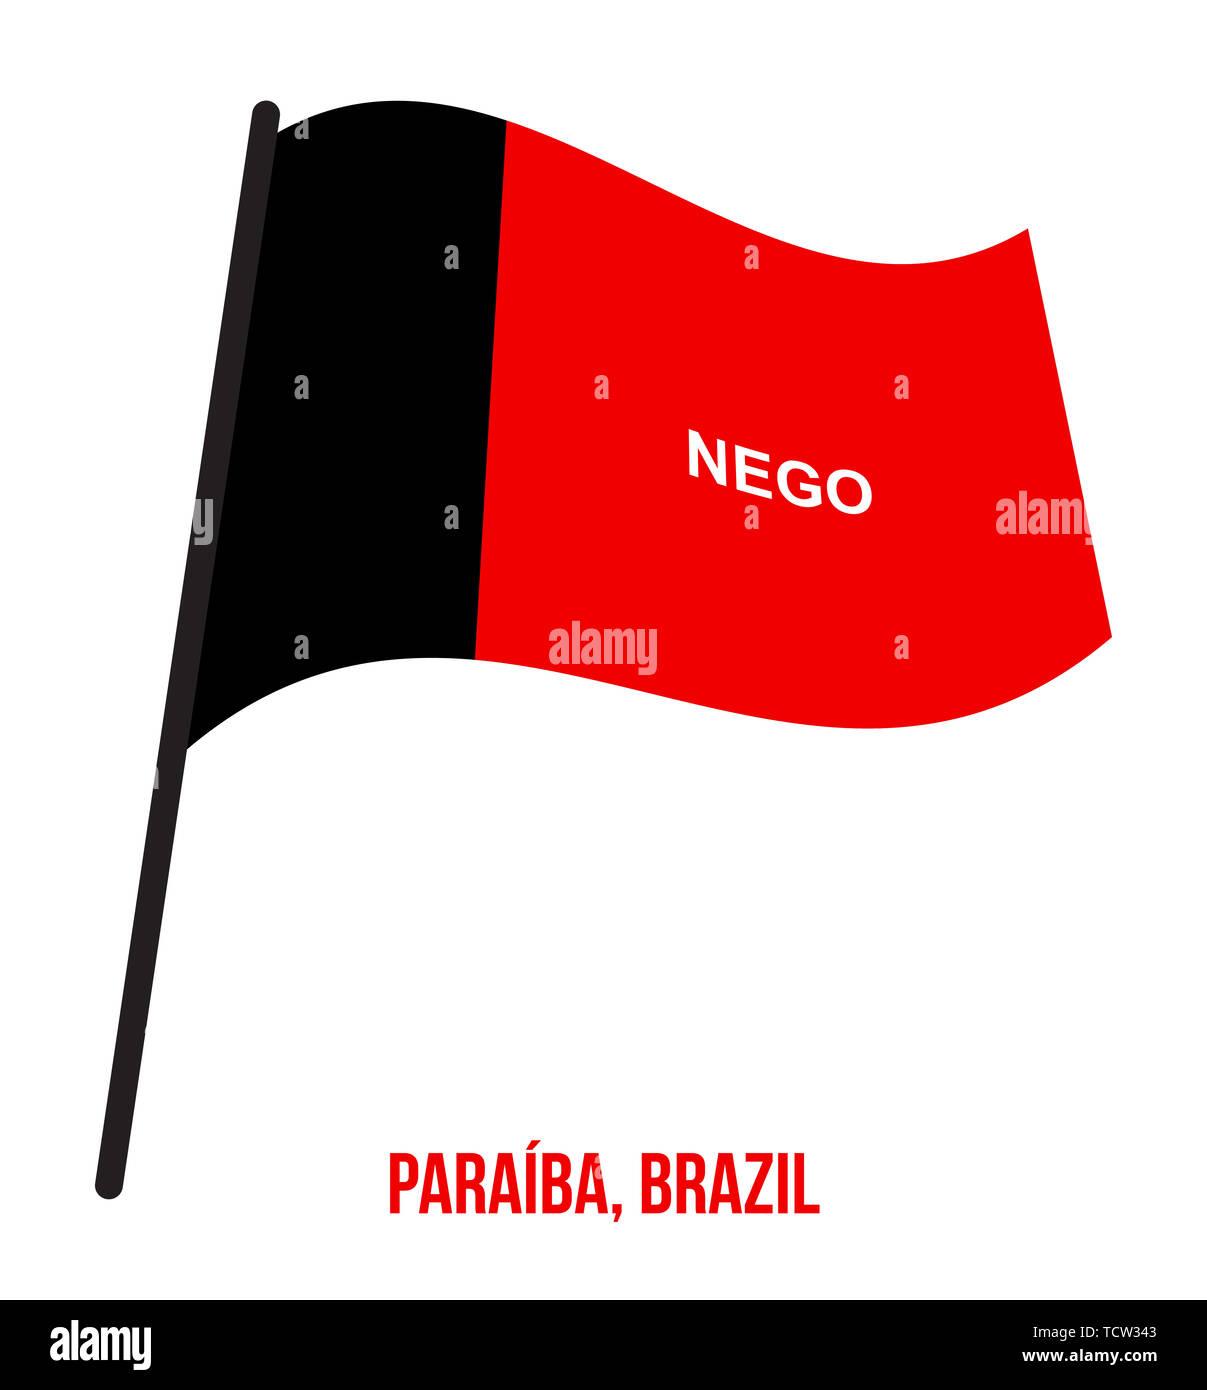 Paraiba Flag Waving Vector Illustration on White Background. States Flag of Brazil. Stock Photo